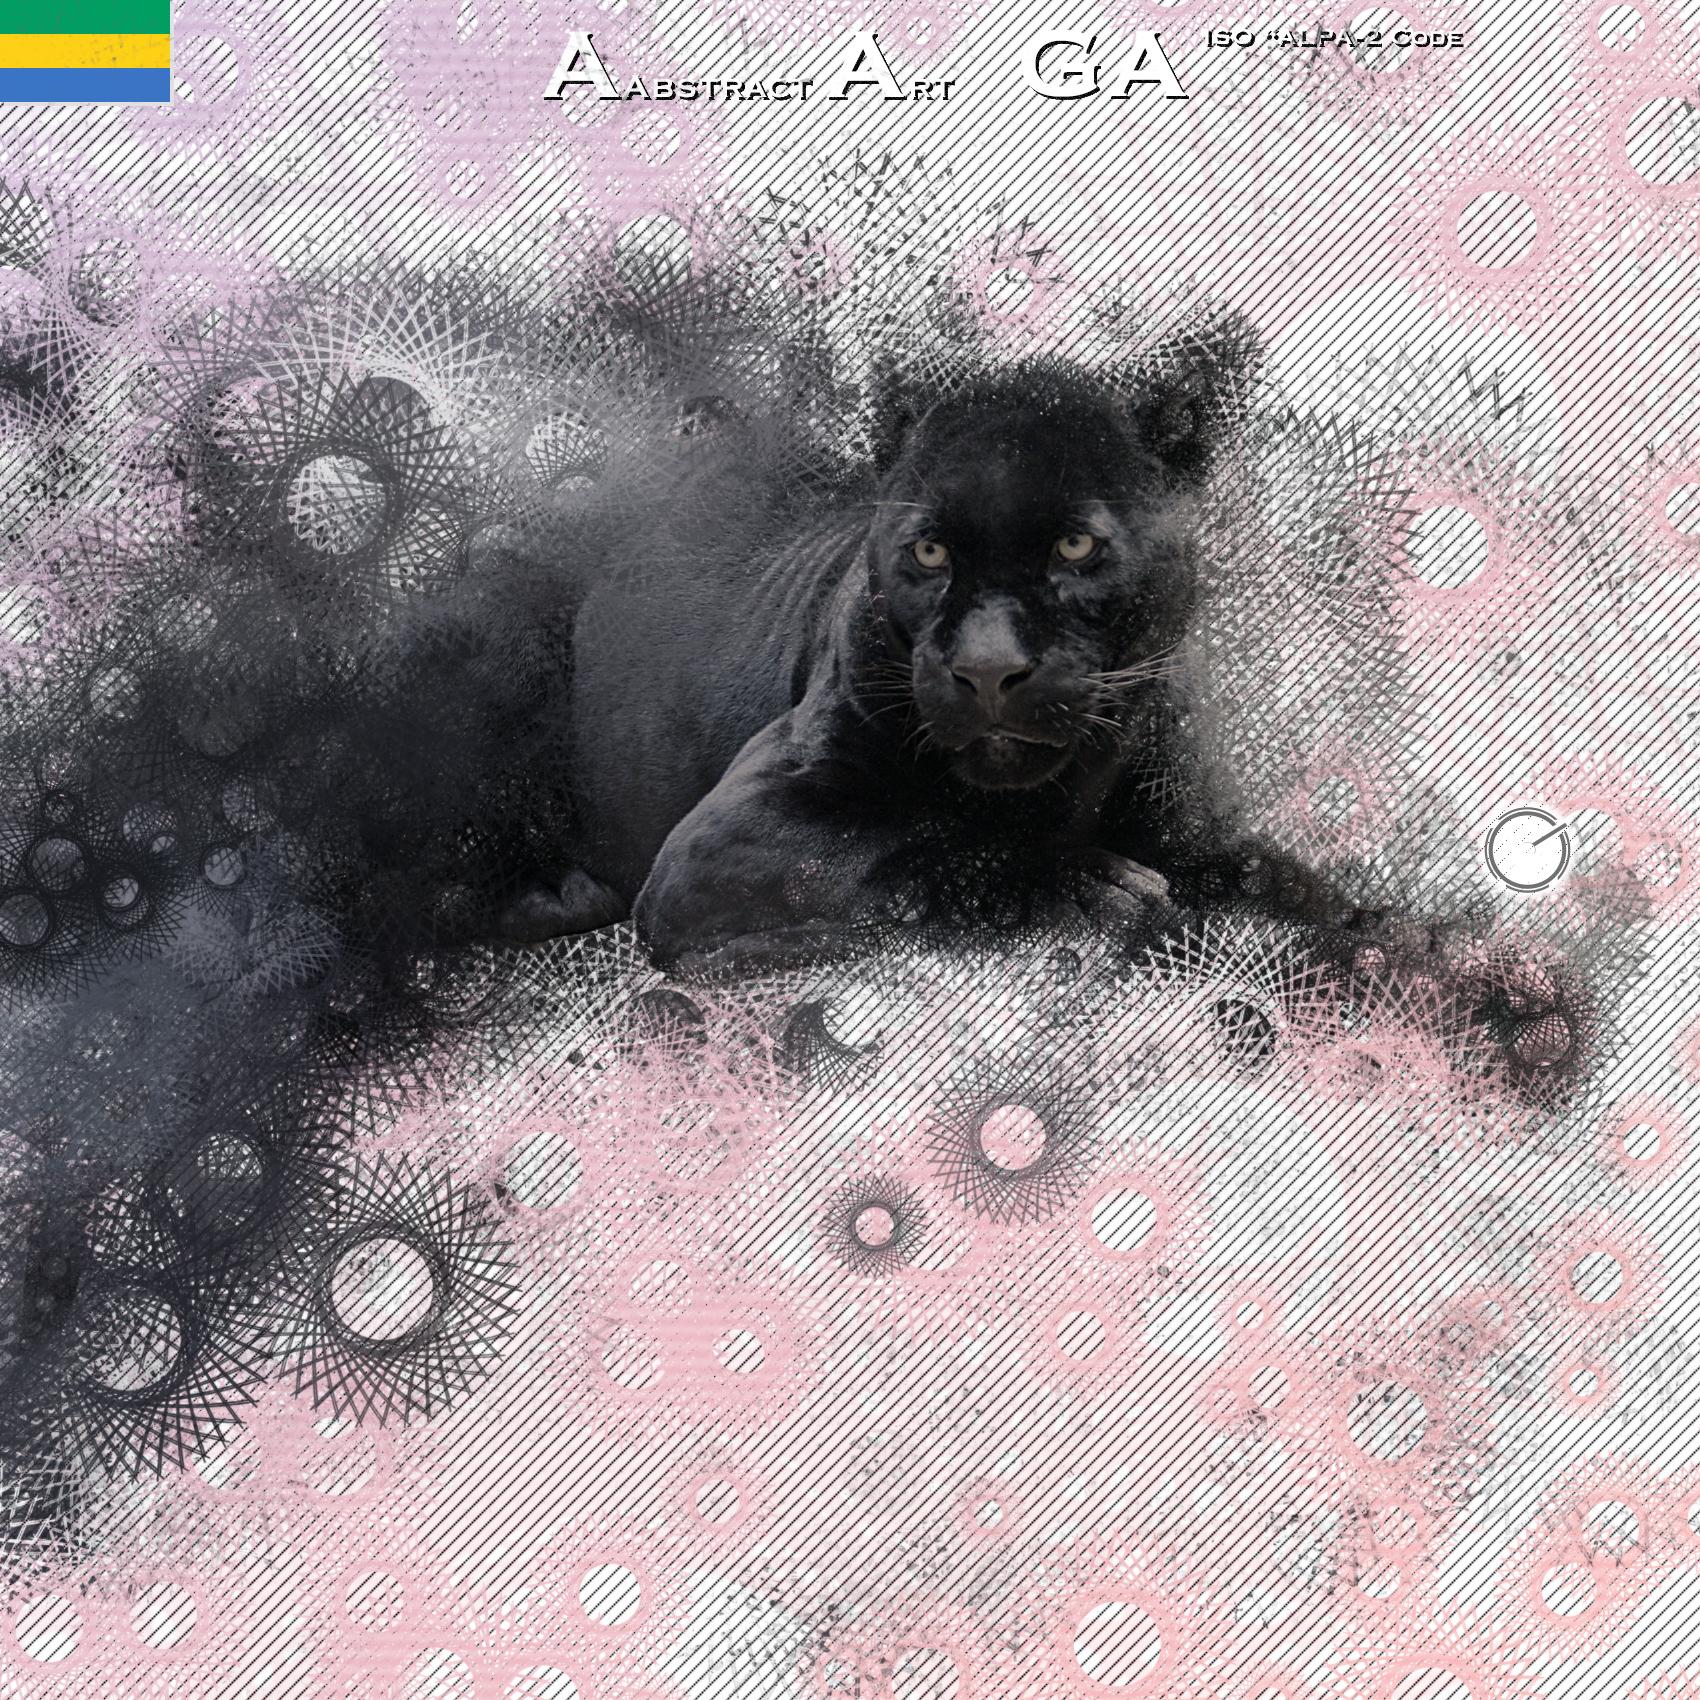 Abstract Art GA